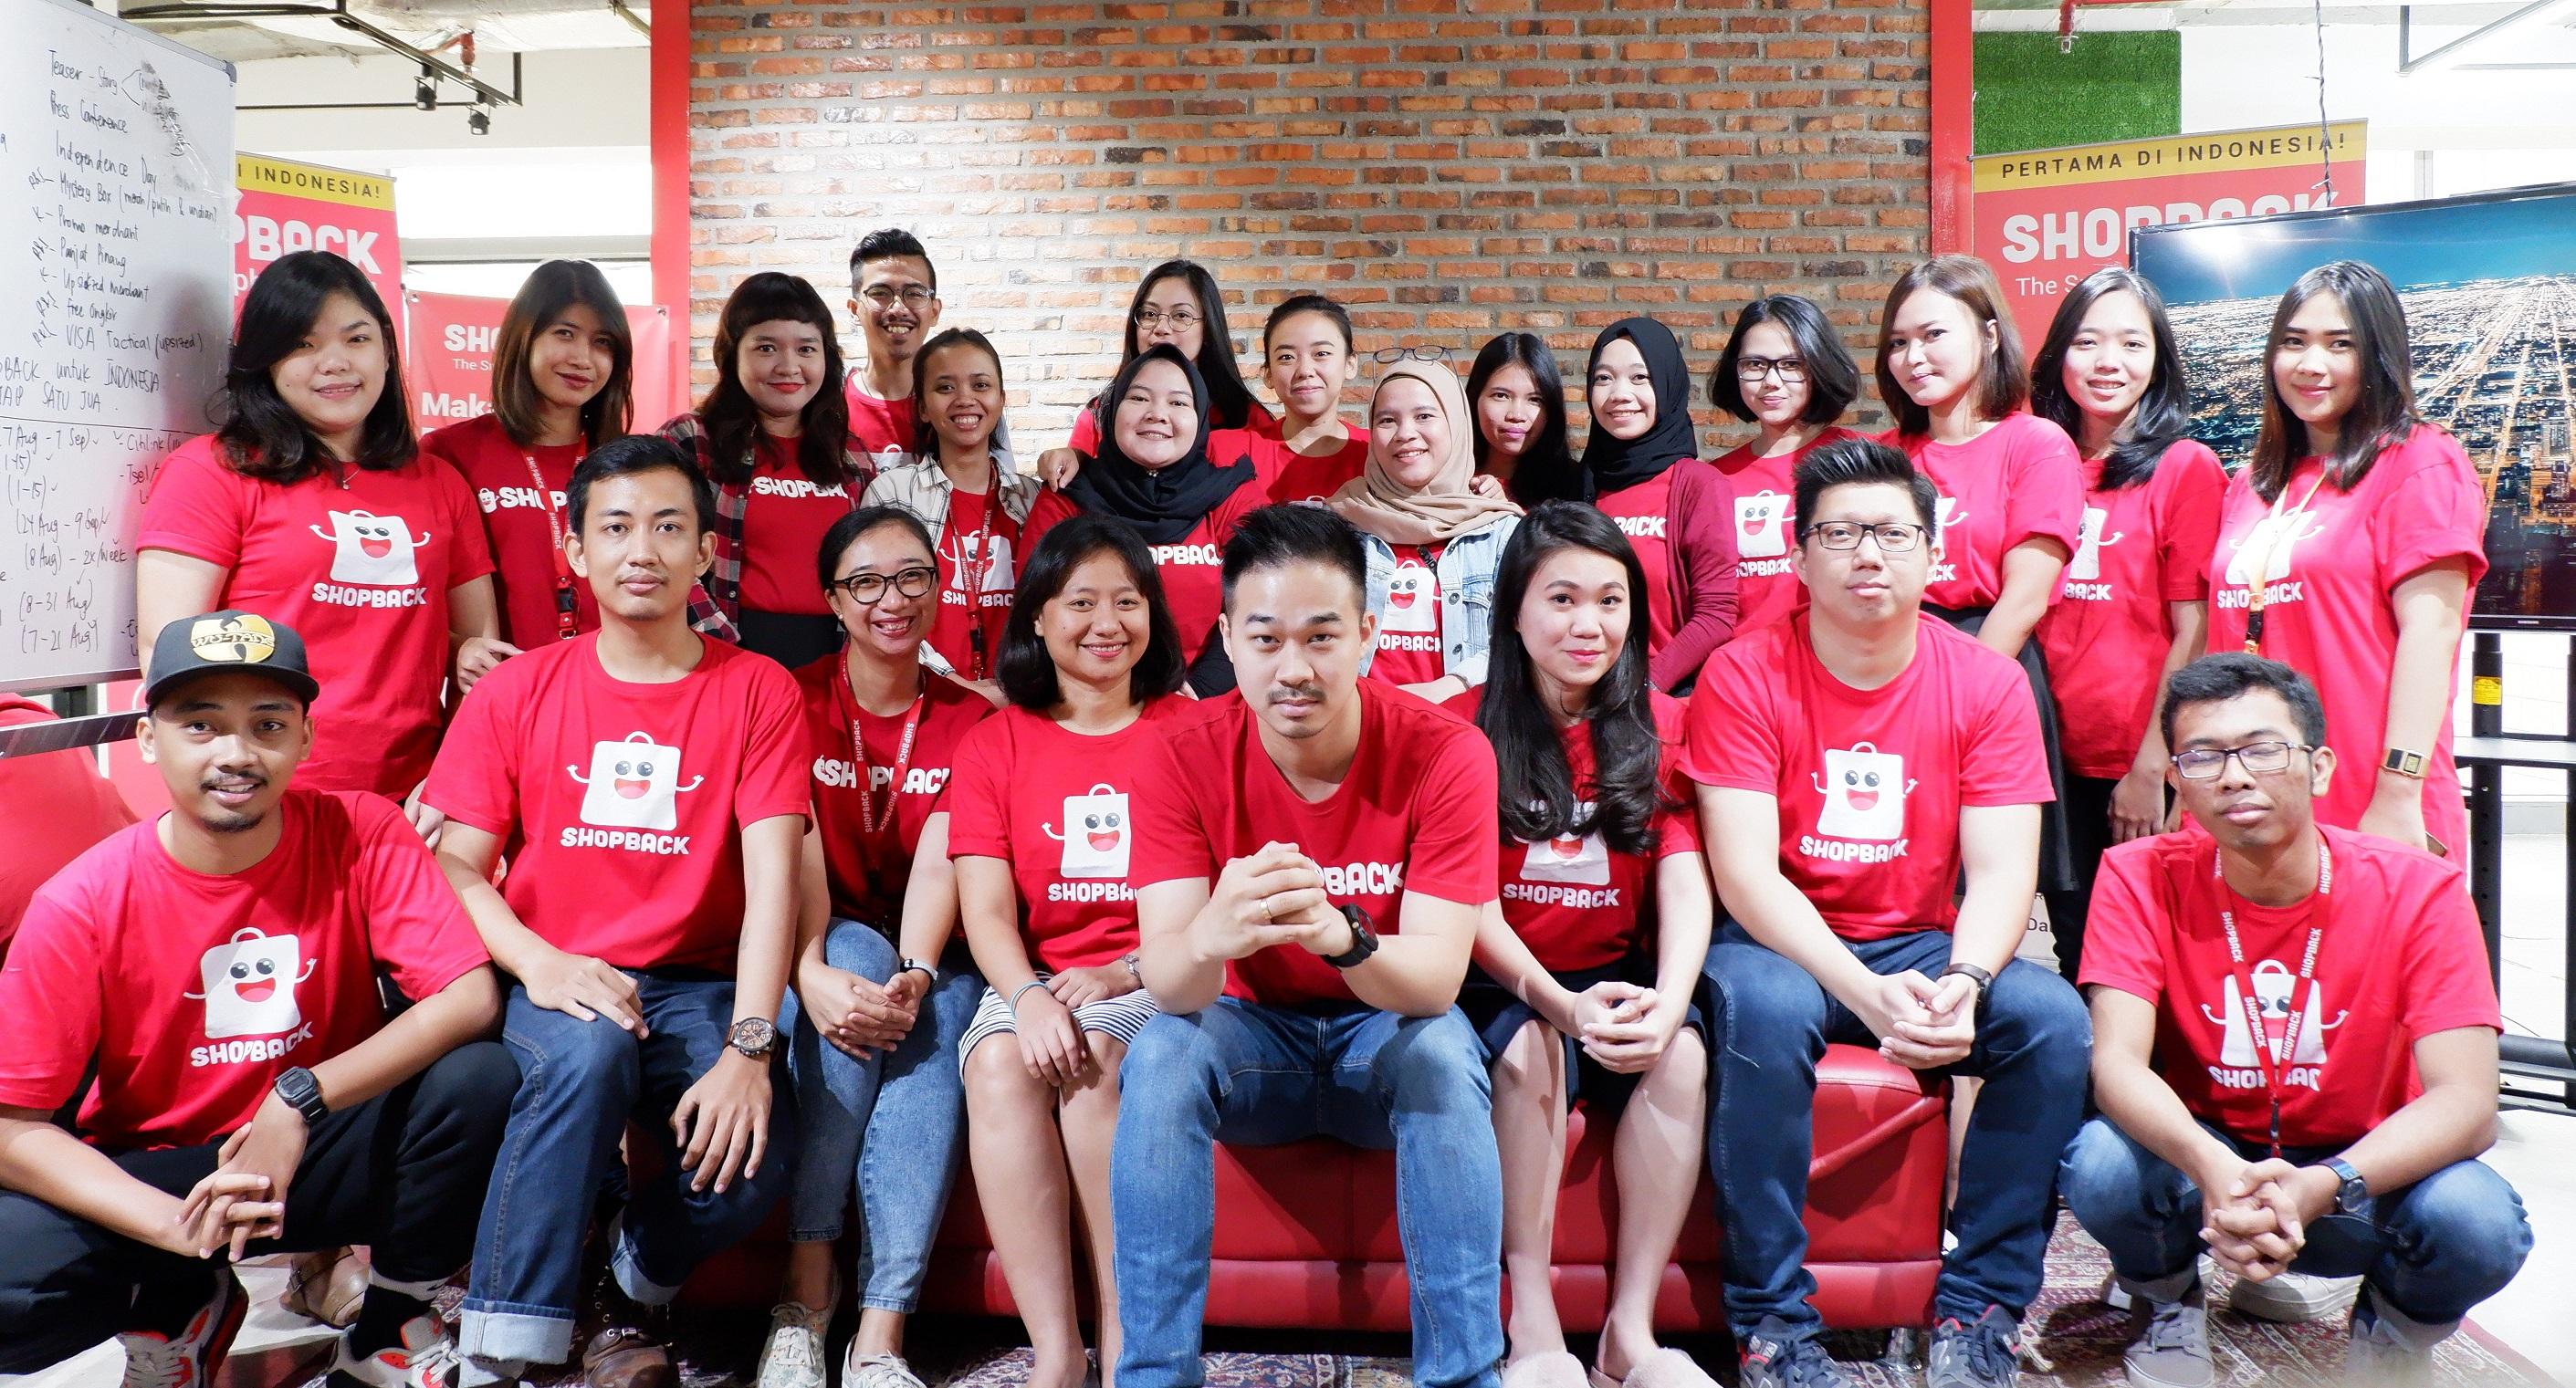 ShopBack Terima Dana Rp 540 Milliar, Indonesia Kecipratan Untung